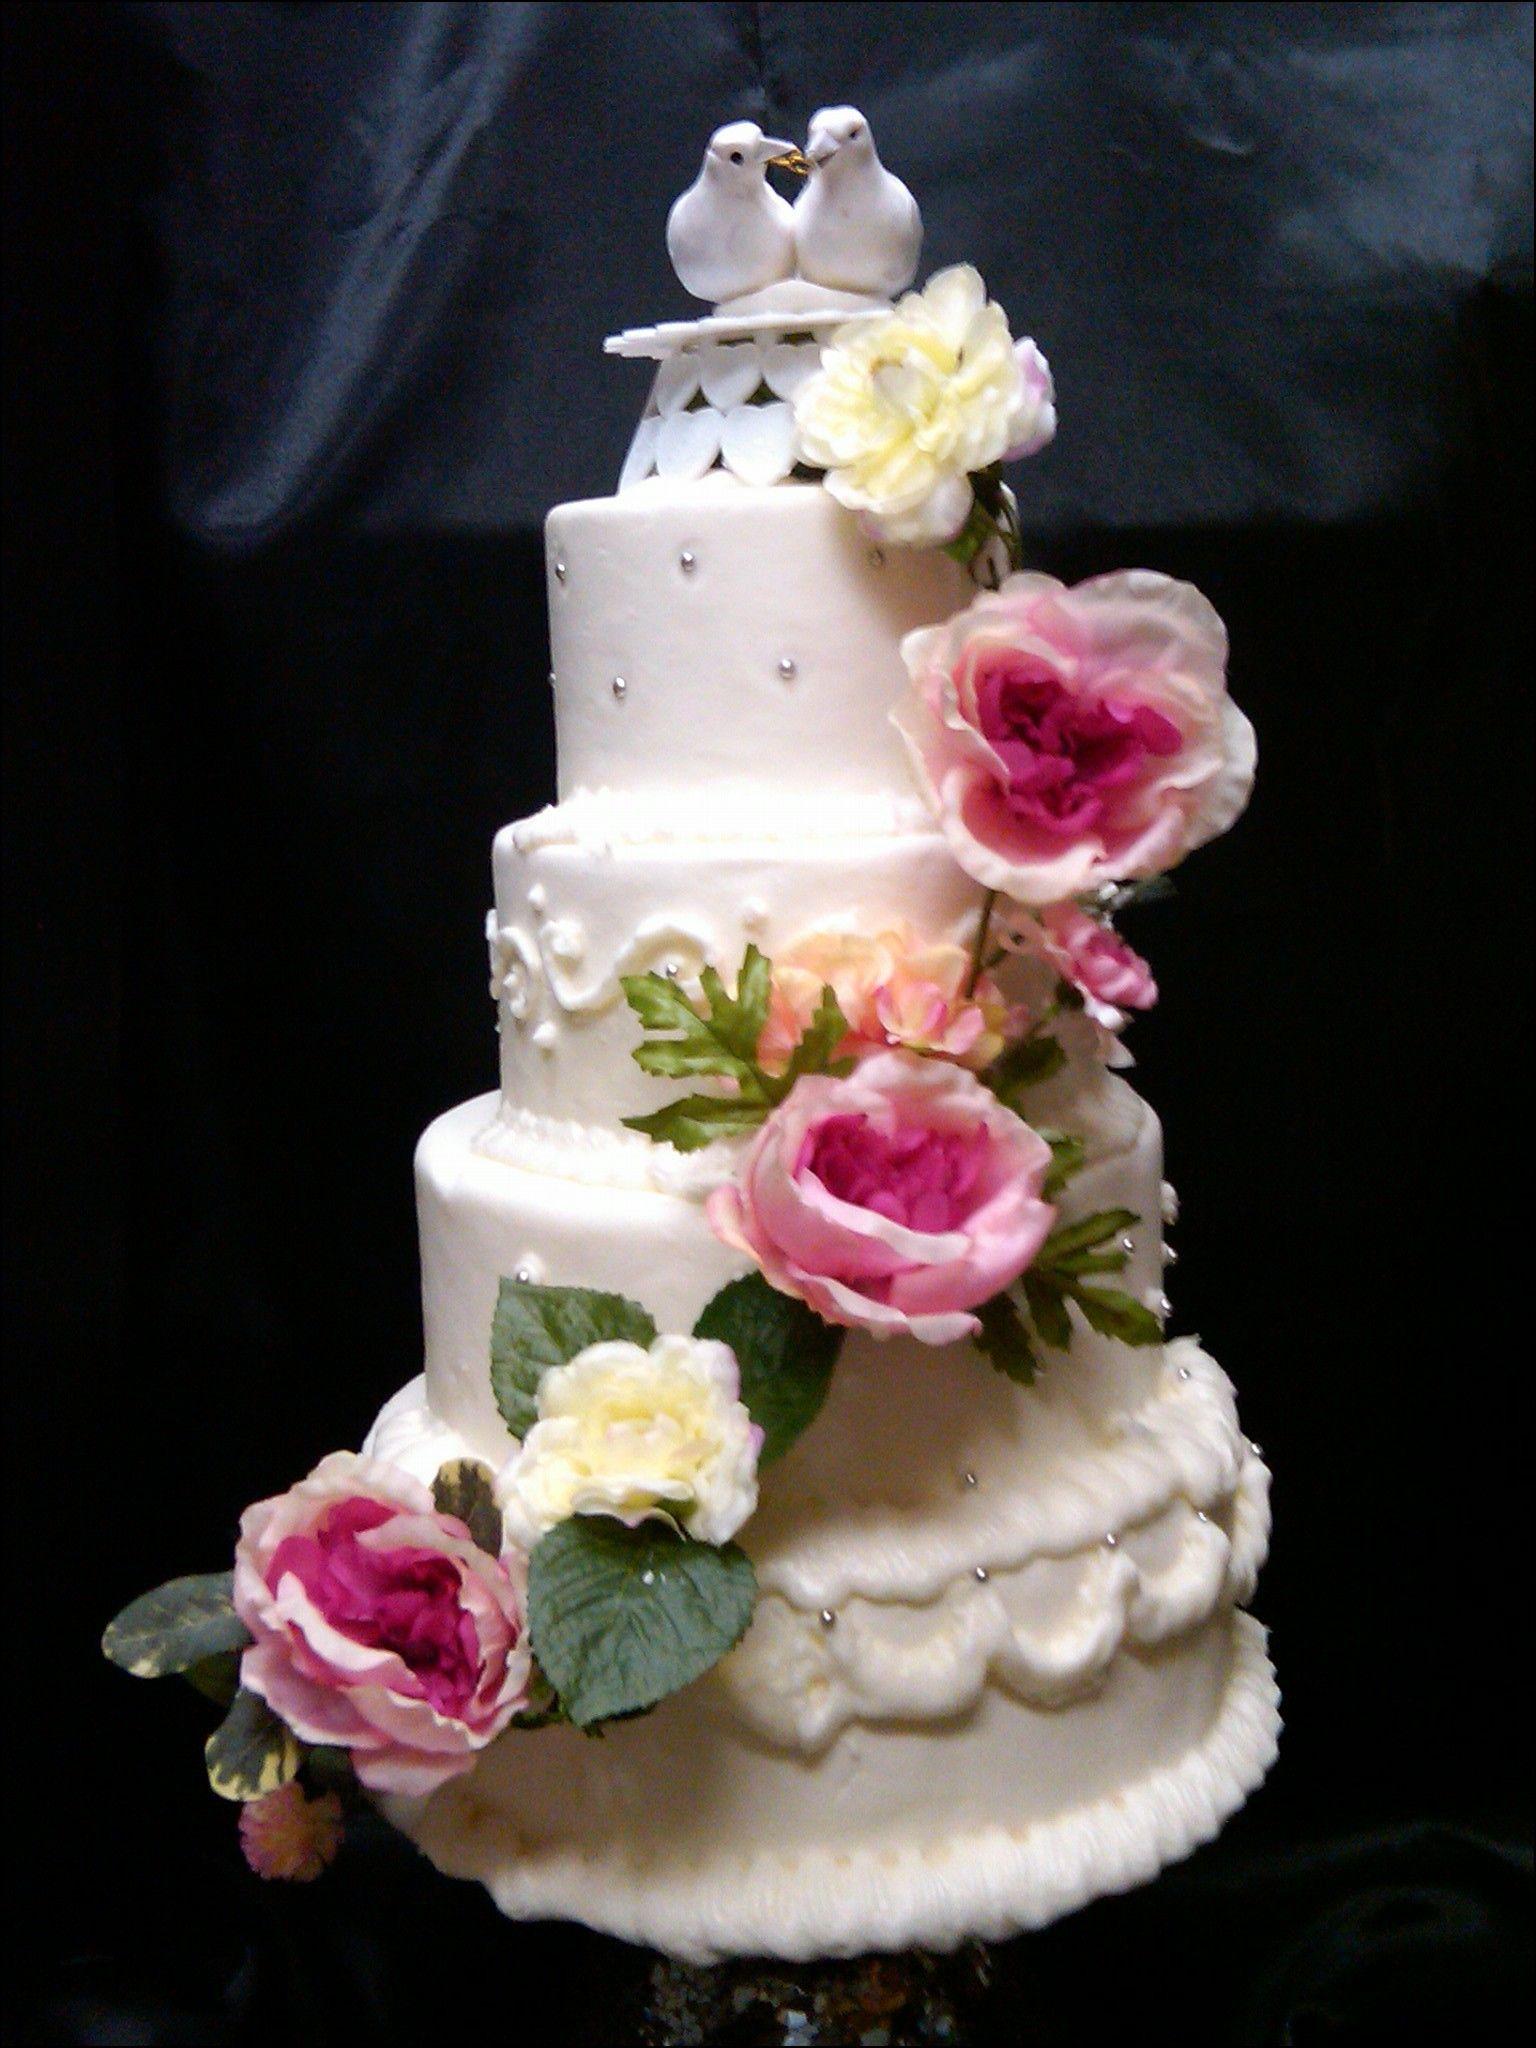 Silk flowers for wedding cakes wedding ideas pinterest silk silk flowers for wedding cakes mightylinksfo